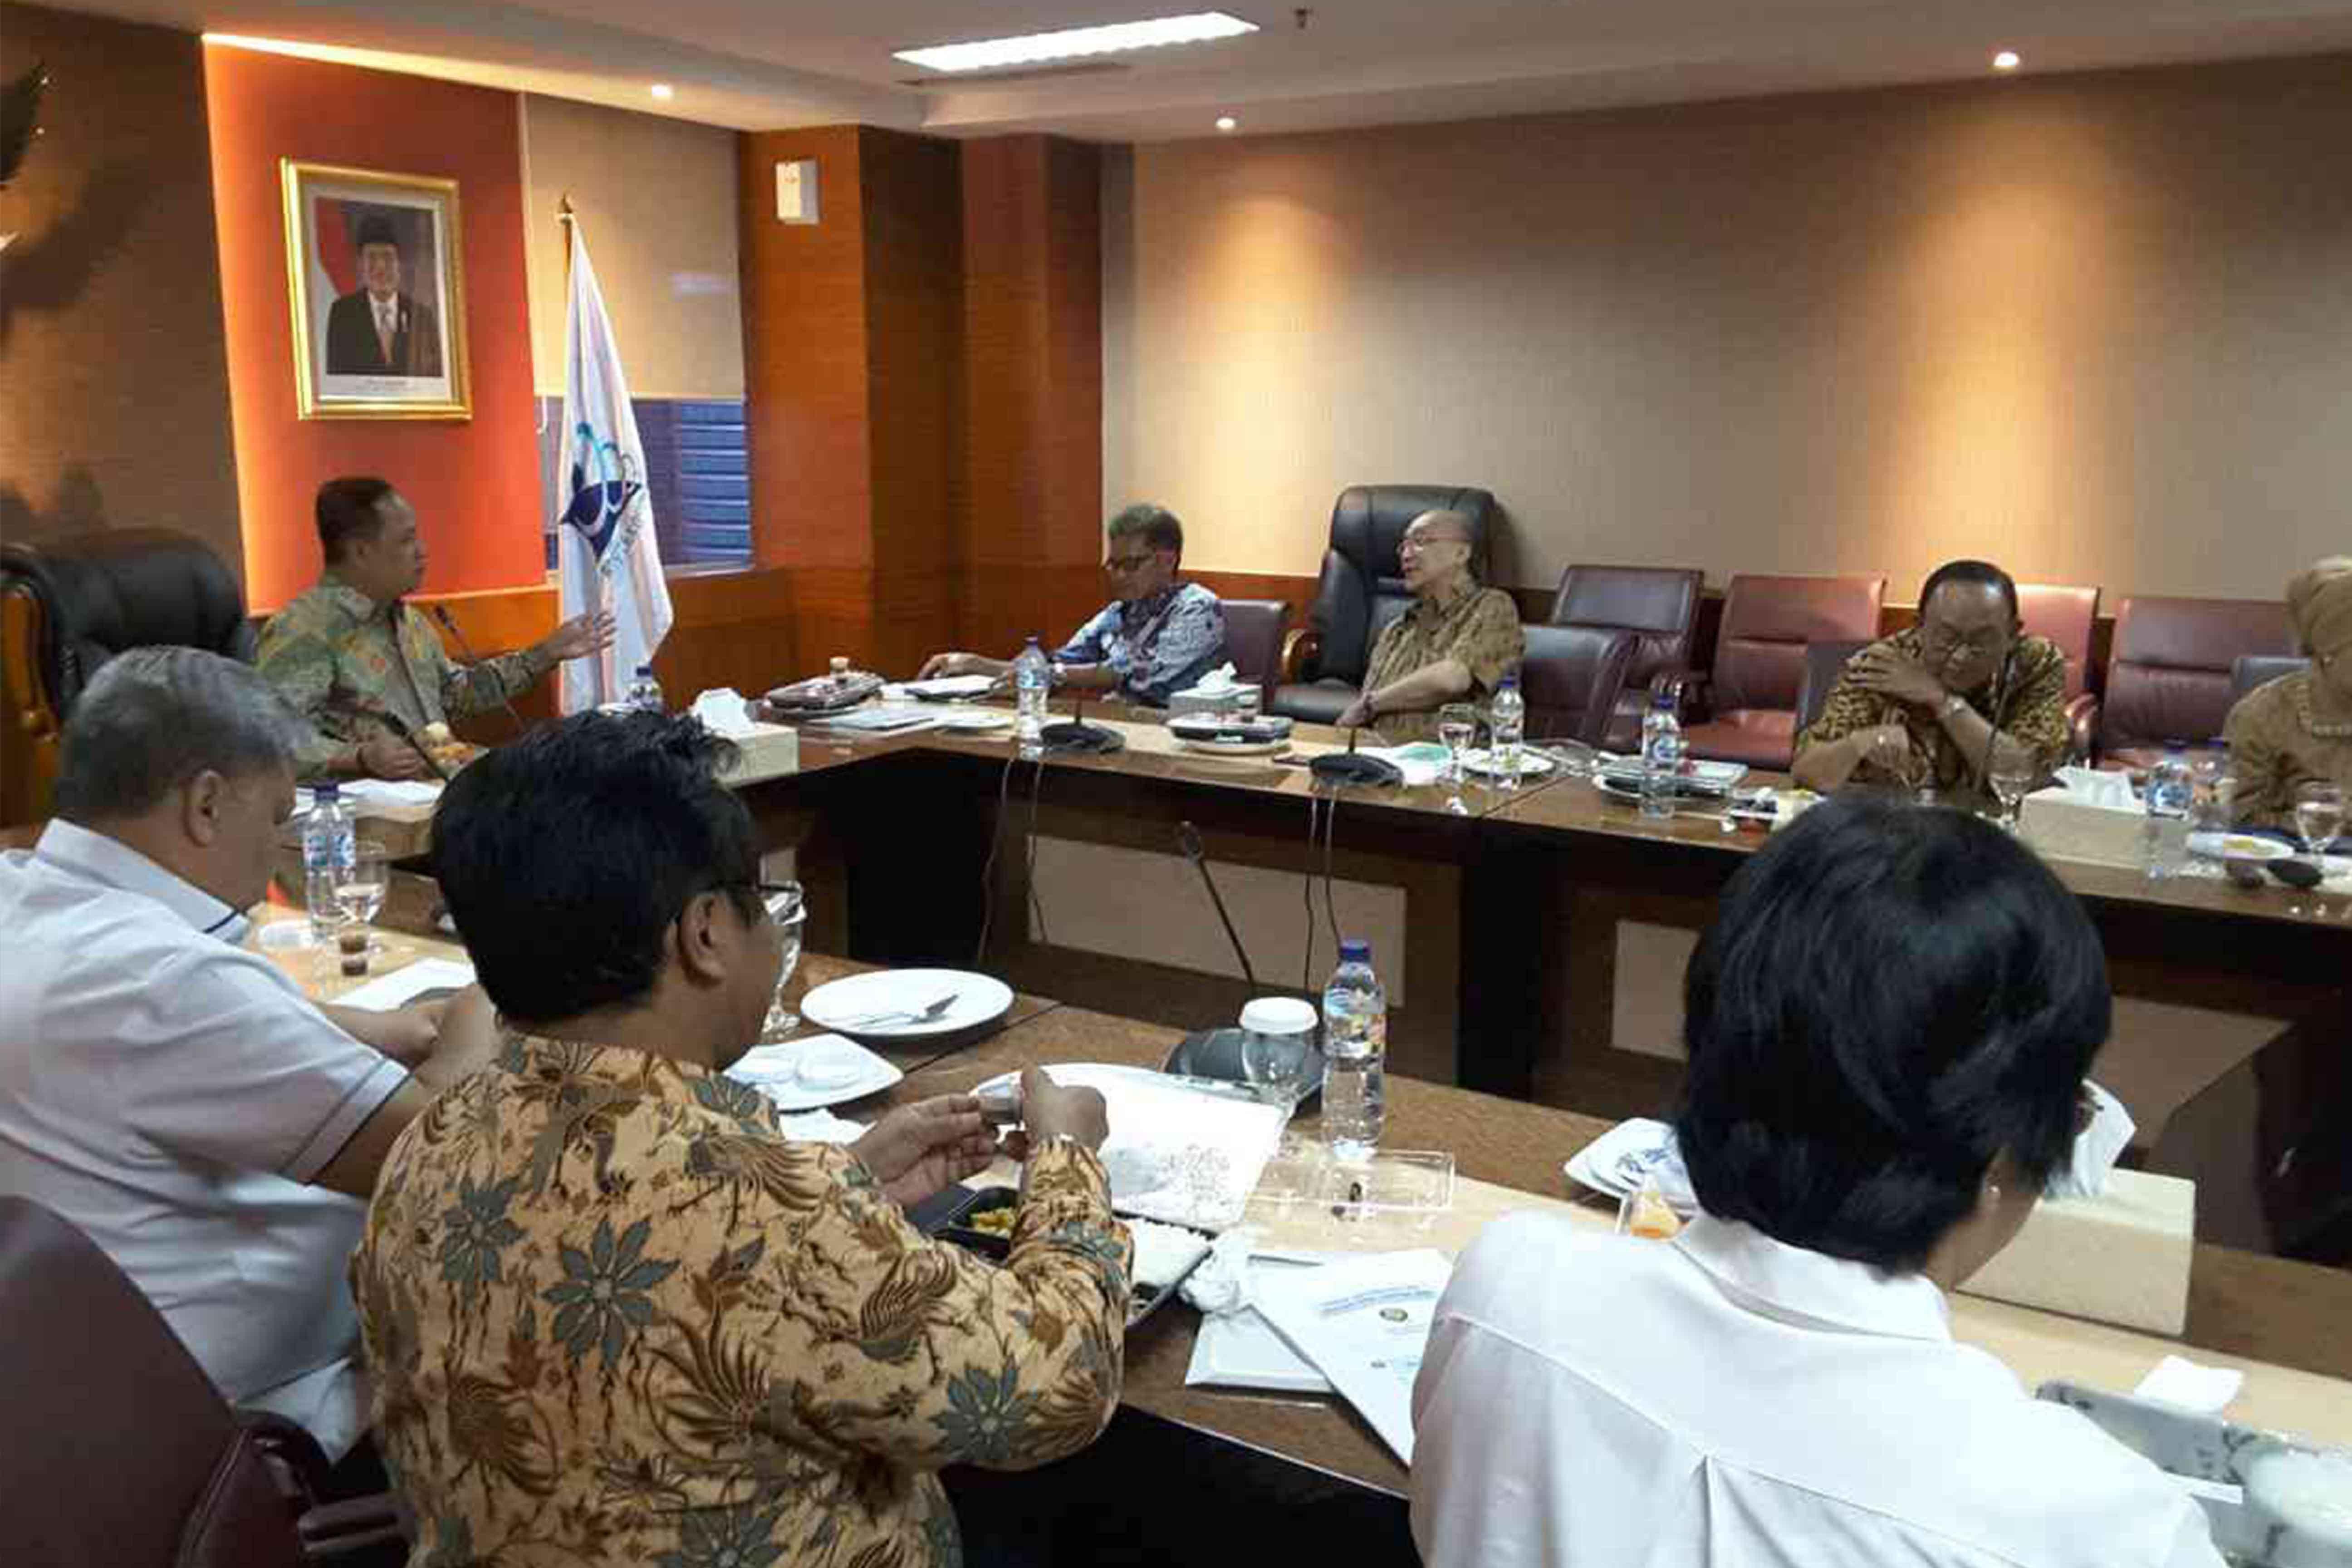 Rapat Koordinasi Pimpinan di Lingkungan Kemenristekdikti, 2 Januari 2018